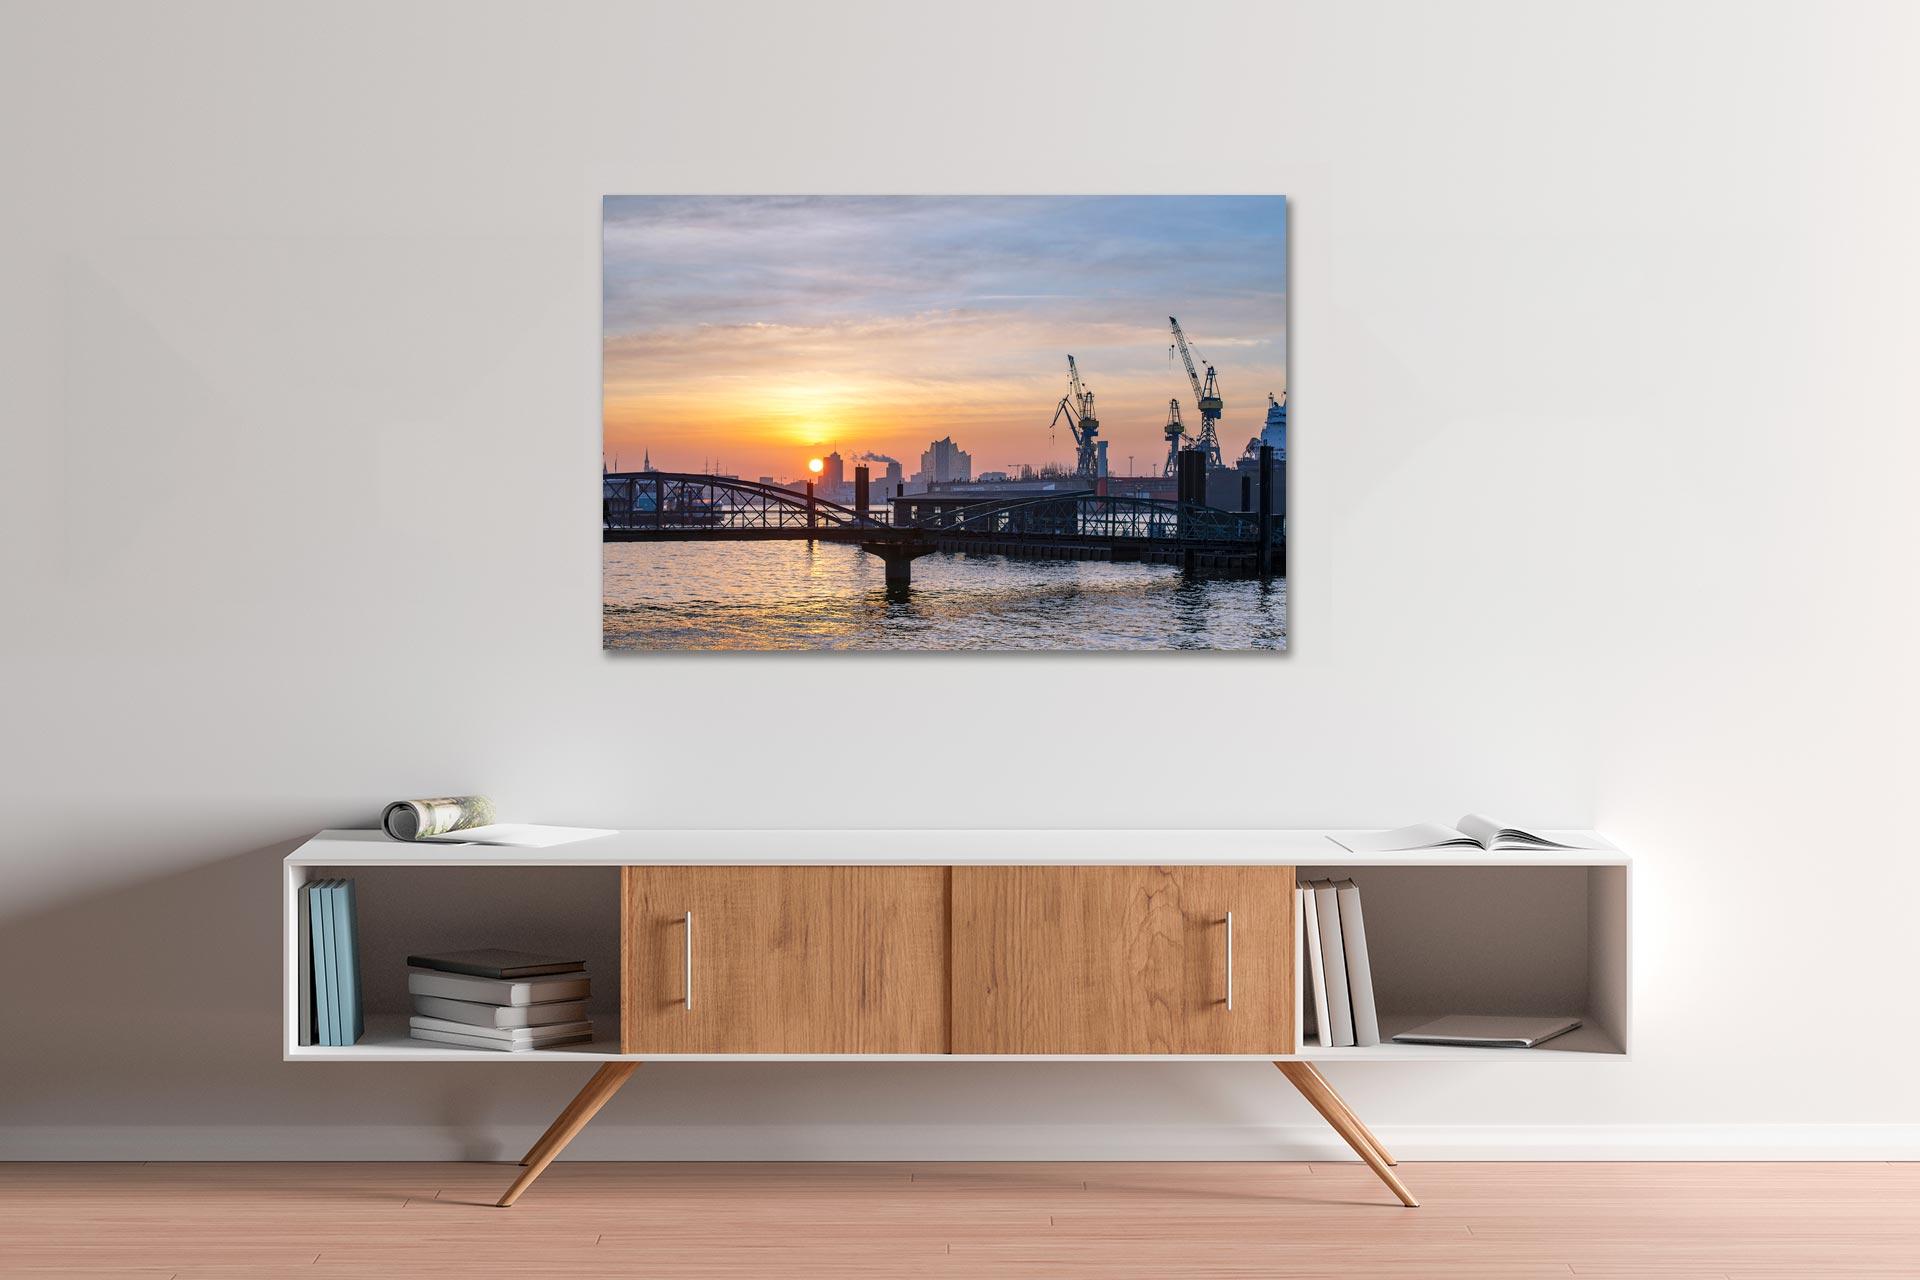 Hafenlicht Hamburg Wandbild auf Leinwand Acrylglas Aludibond